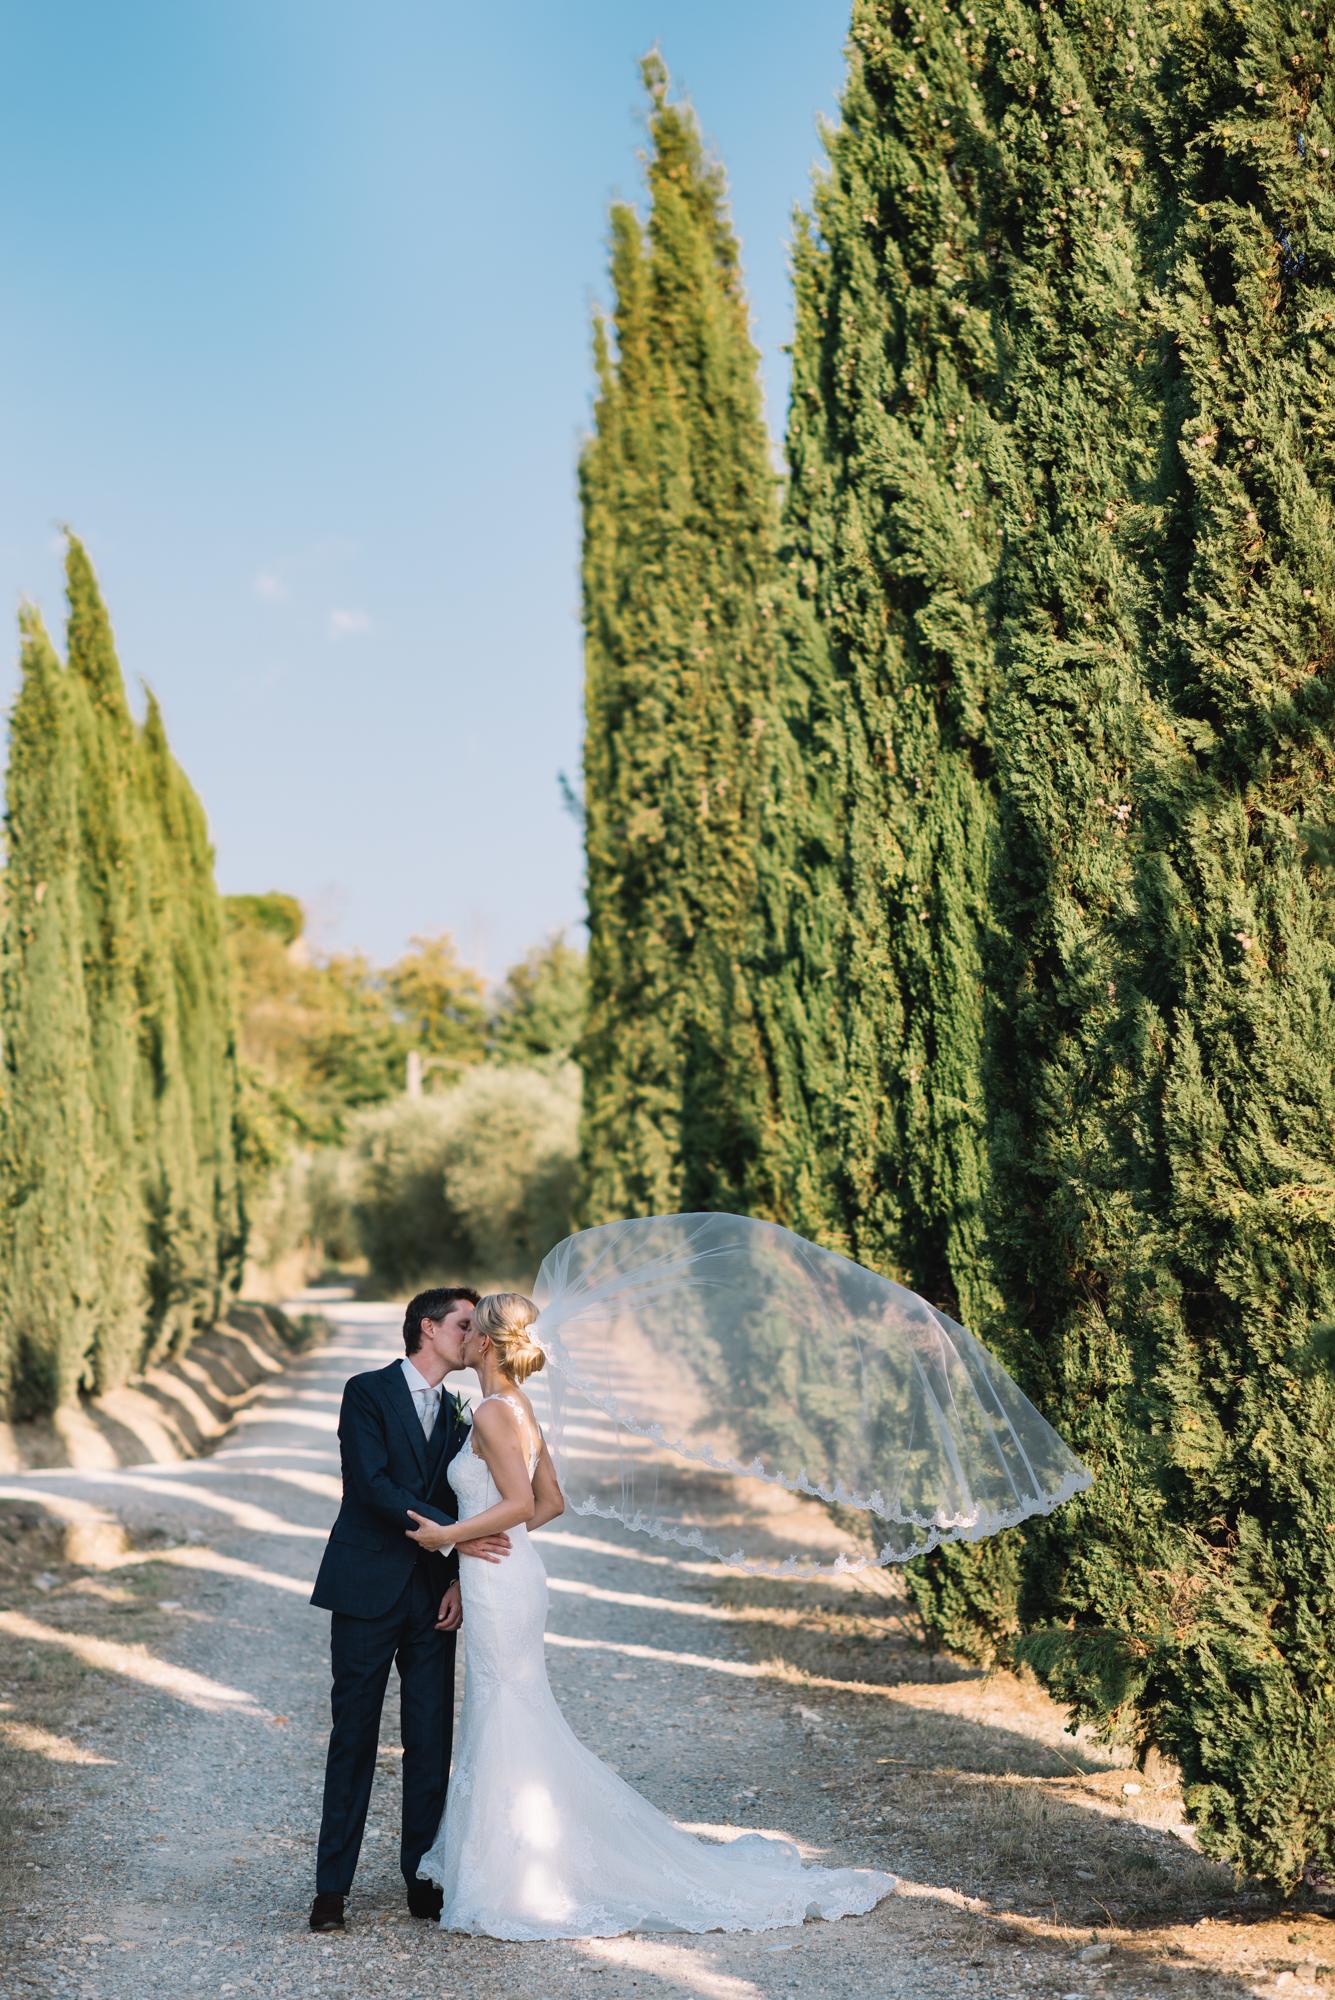 Wedding_Photographer_in_Tuscany_Italy-019.jpg